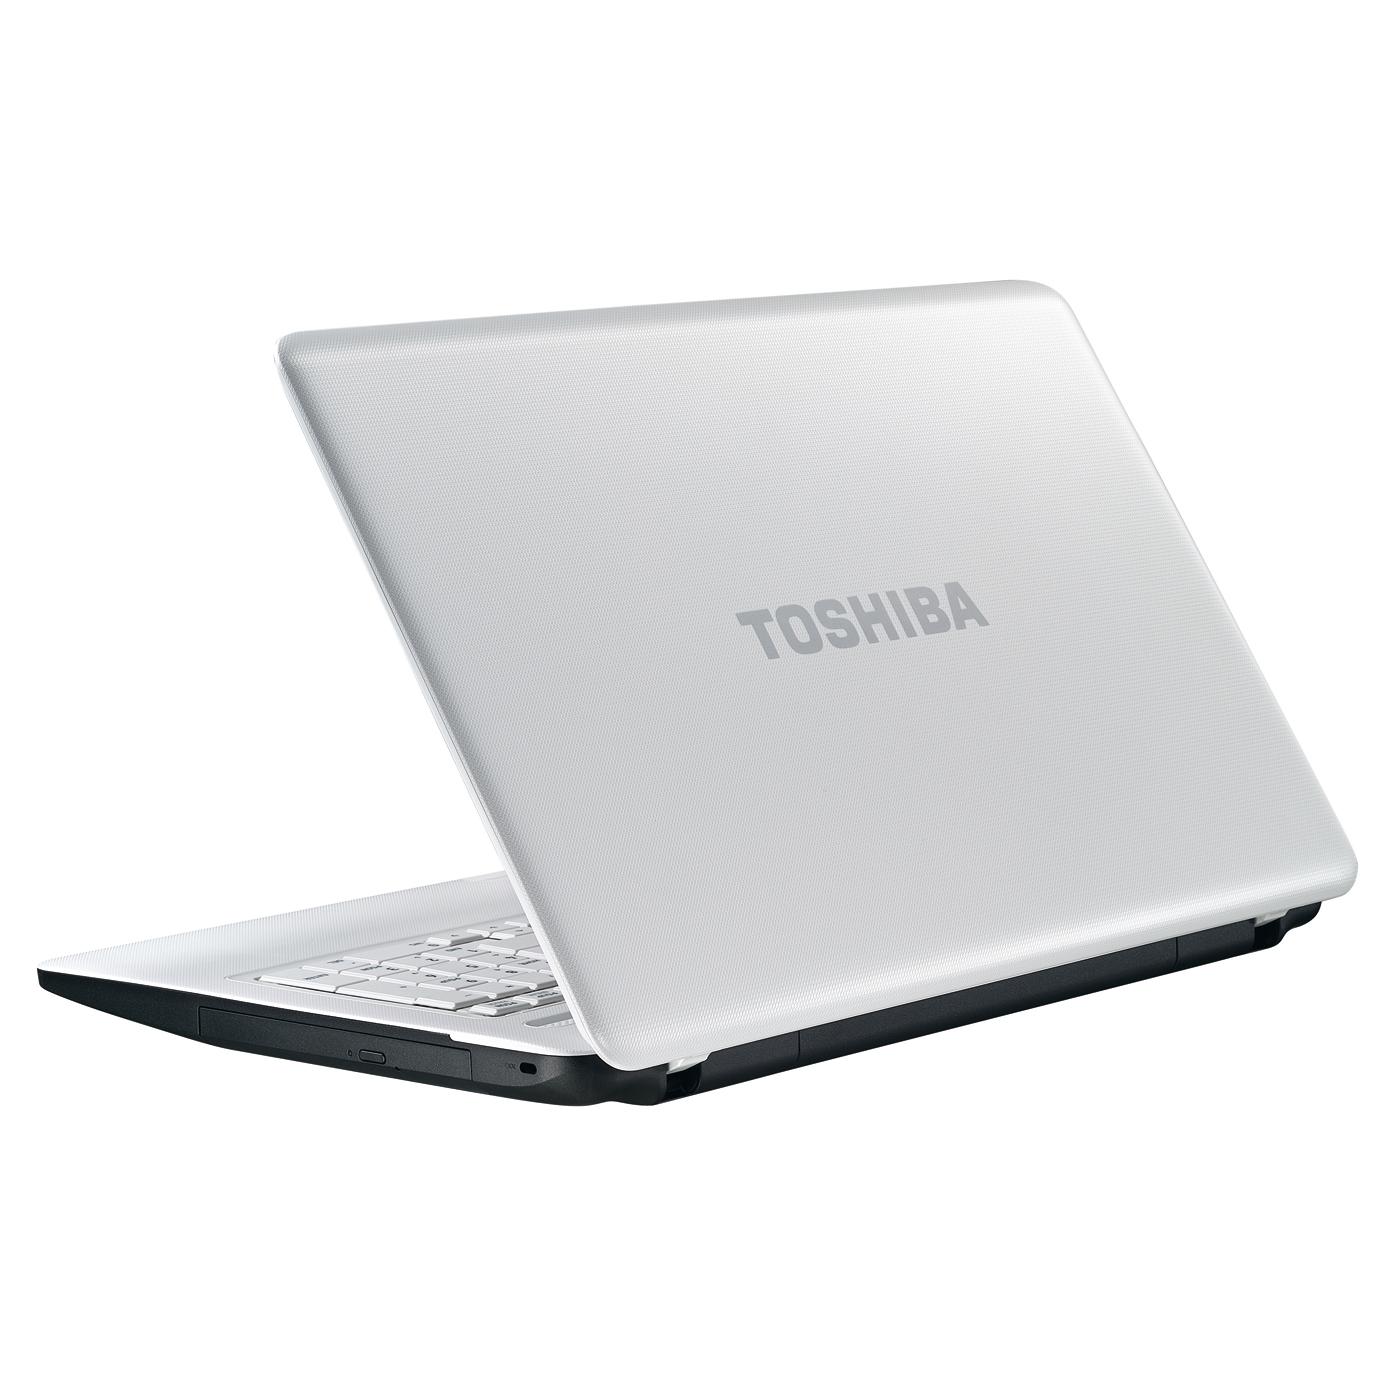 Toshiba Satellite C670-12N